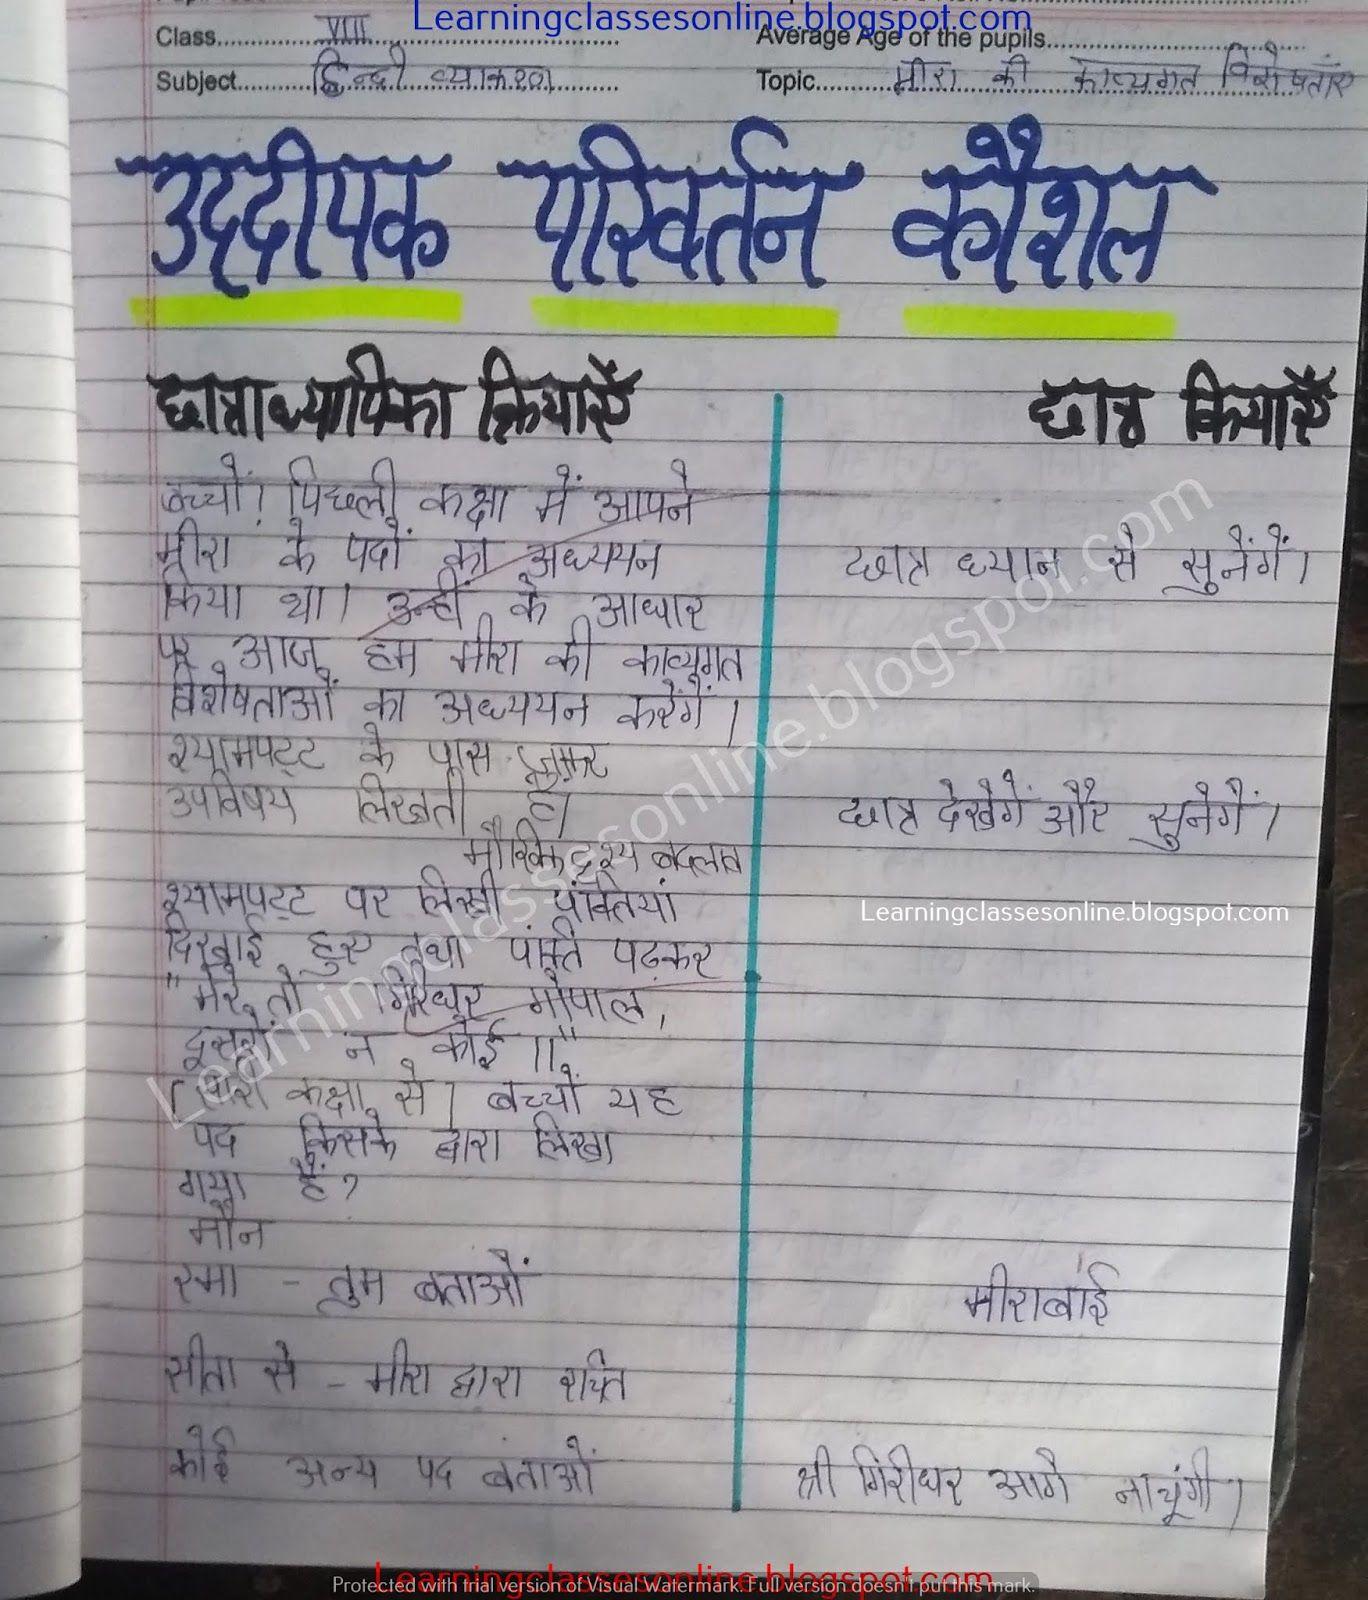 Miroteaching Lesson Plan In Hindi On Uddipan Partivartan Koshal Meera Ka Kavya For Class 6 To 8 In 2021 Lesson Plan In Hindi Teaching Lessons Plans Teaching Lessons [ 1600 x 1368 Pixel ]